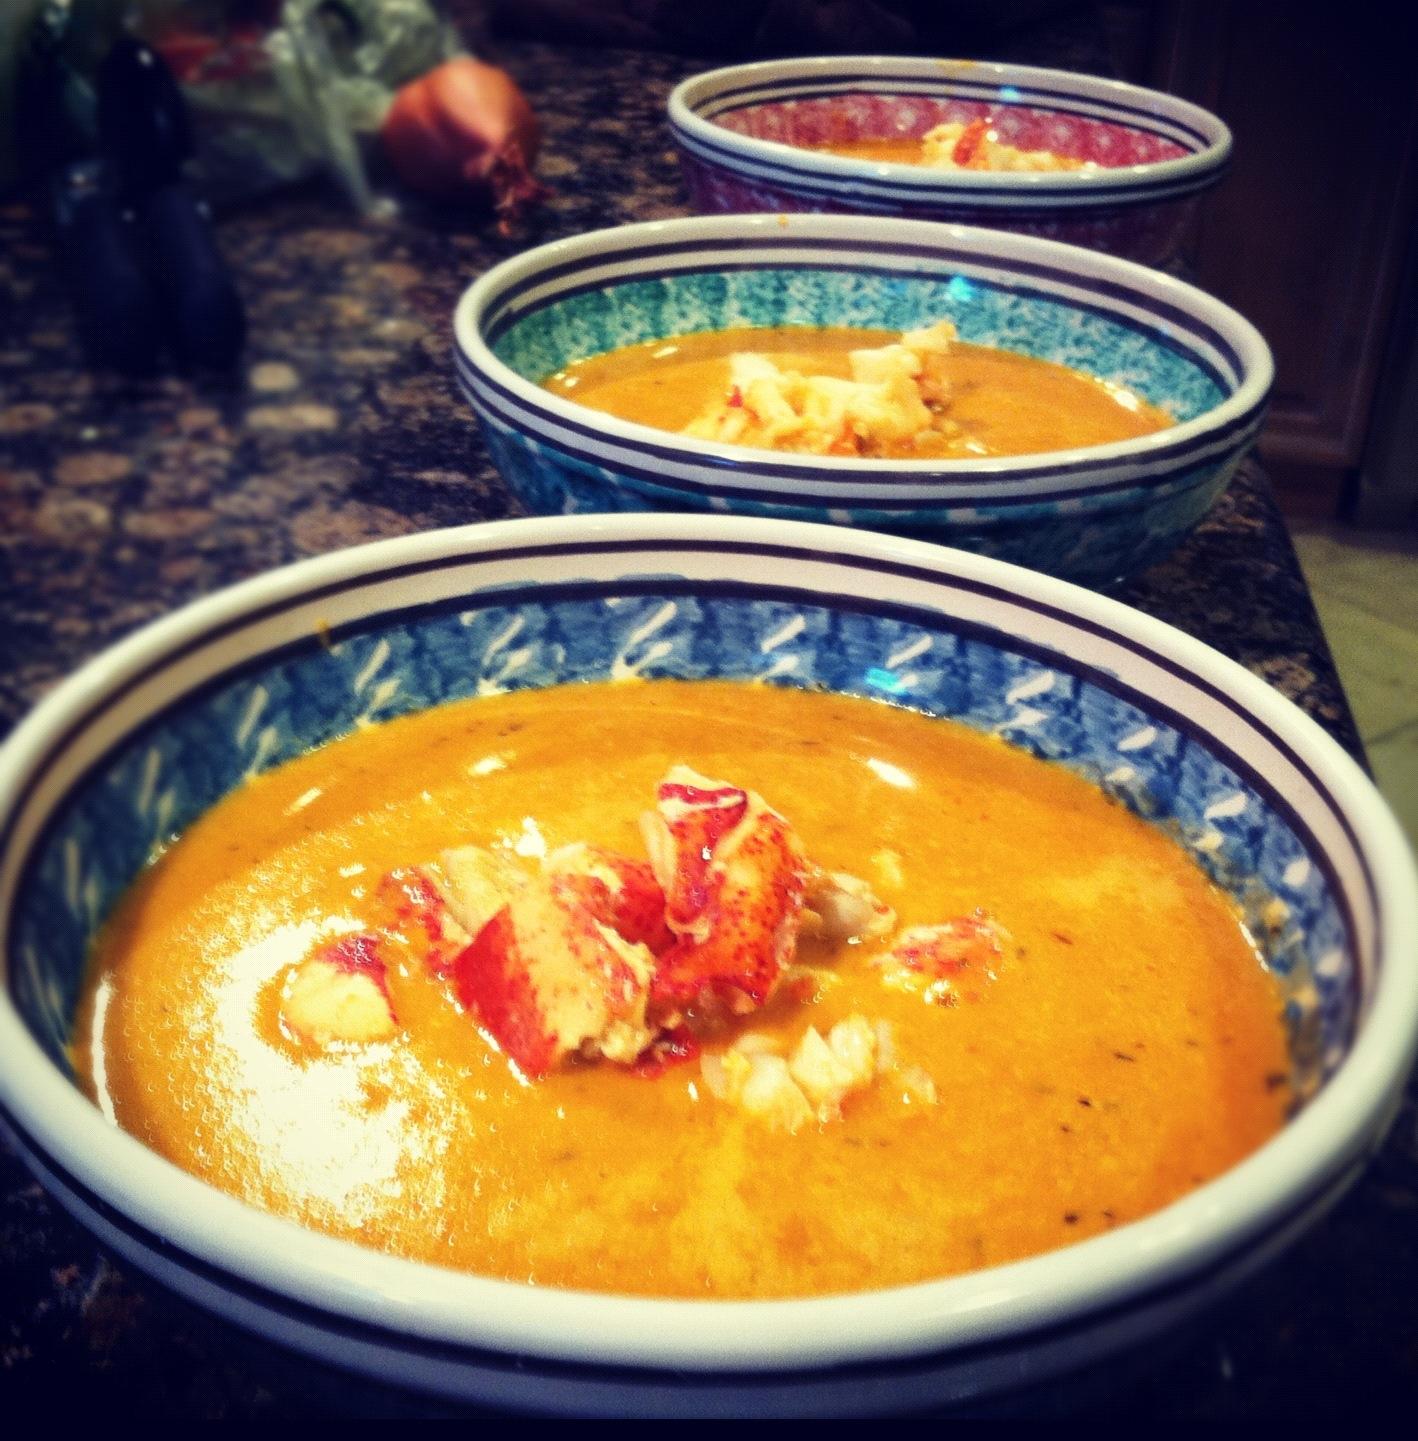 Lobster Bisque Recipes: Lobster Bisque, Focaccia & Arugula Salad